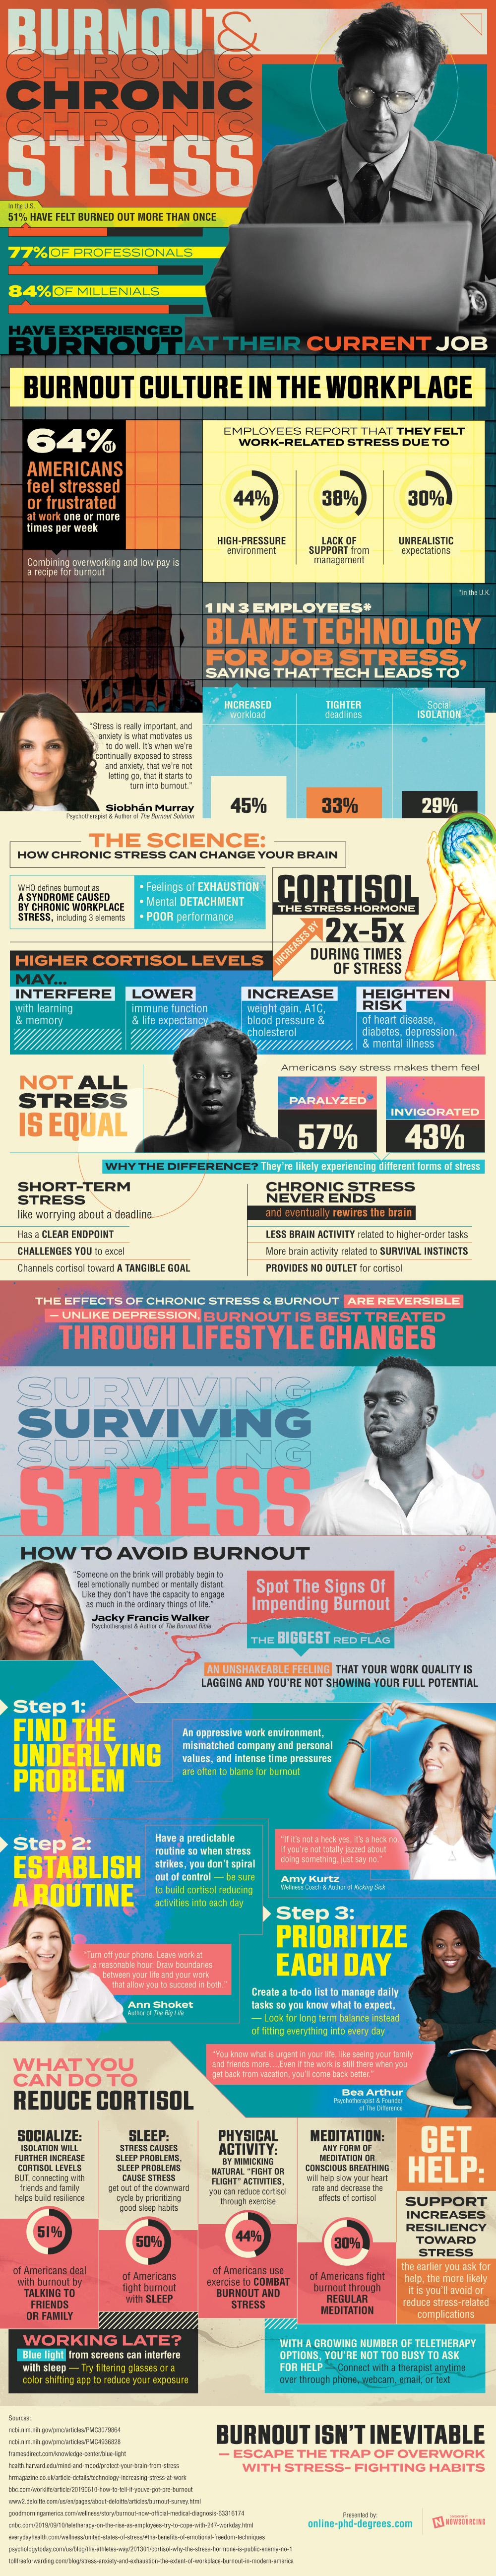 Burnout e stress cronico